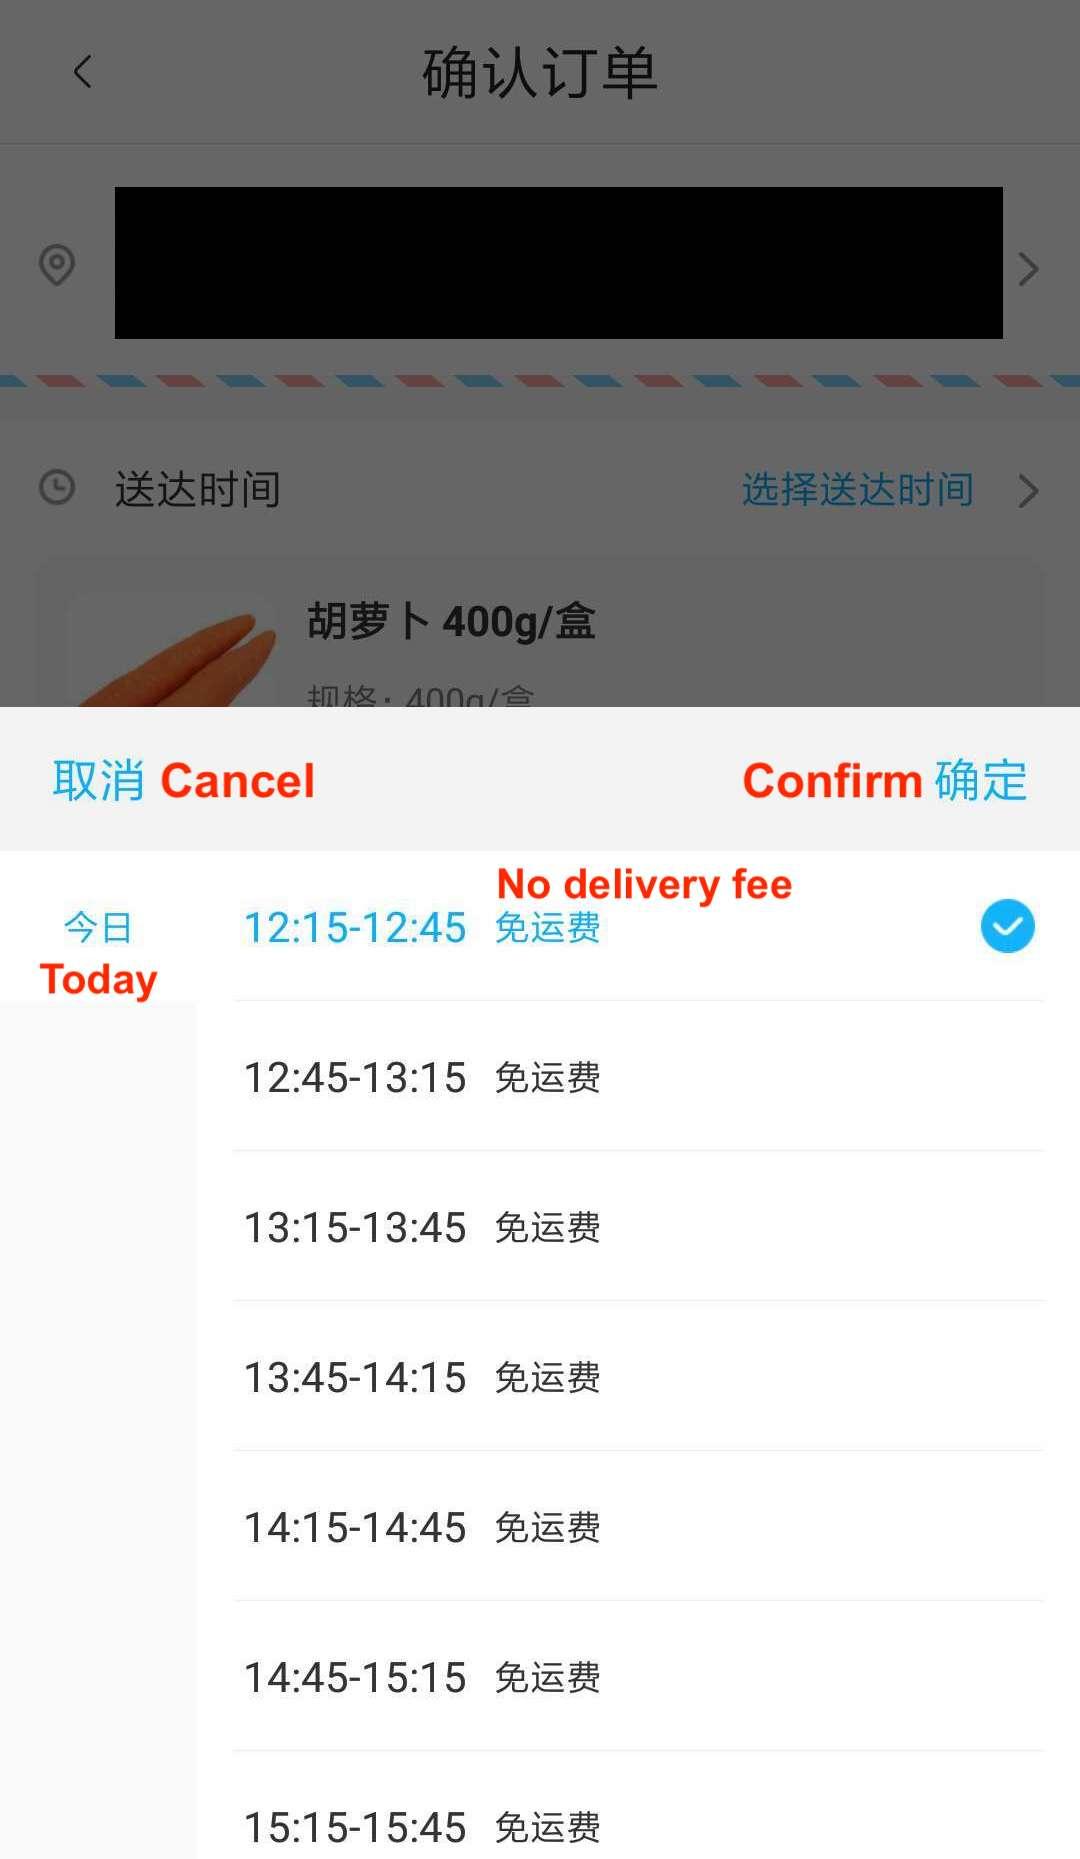 hema-xiansheng-delivery-time-checkout.jpeg